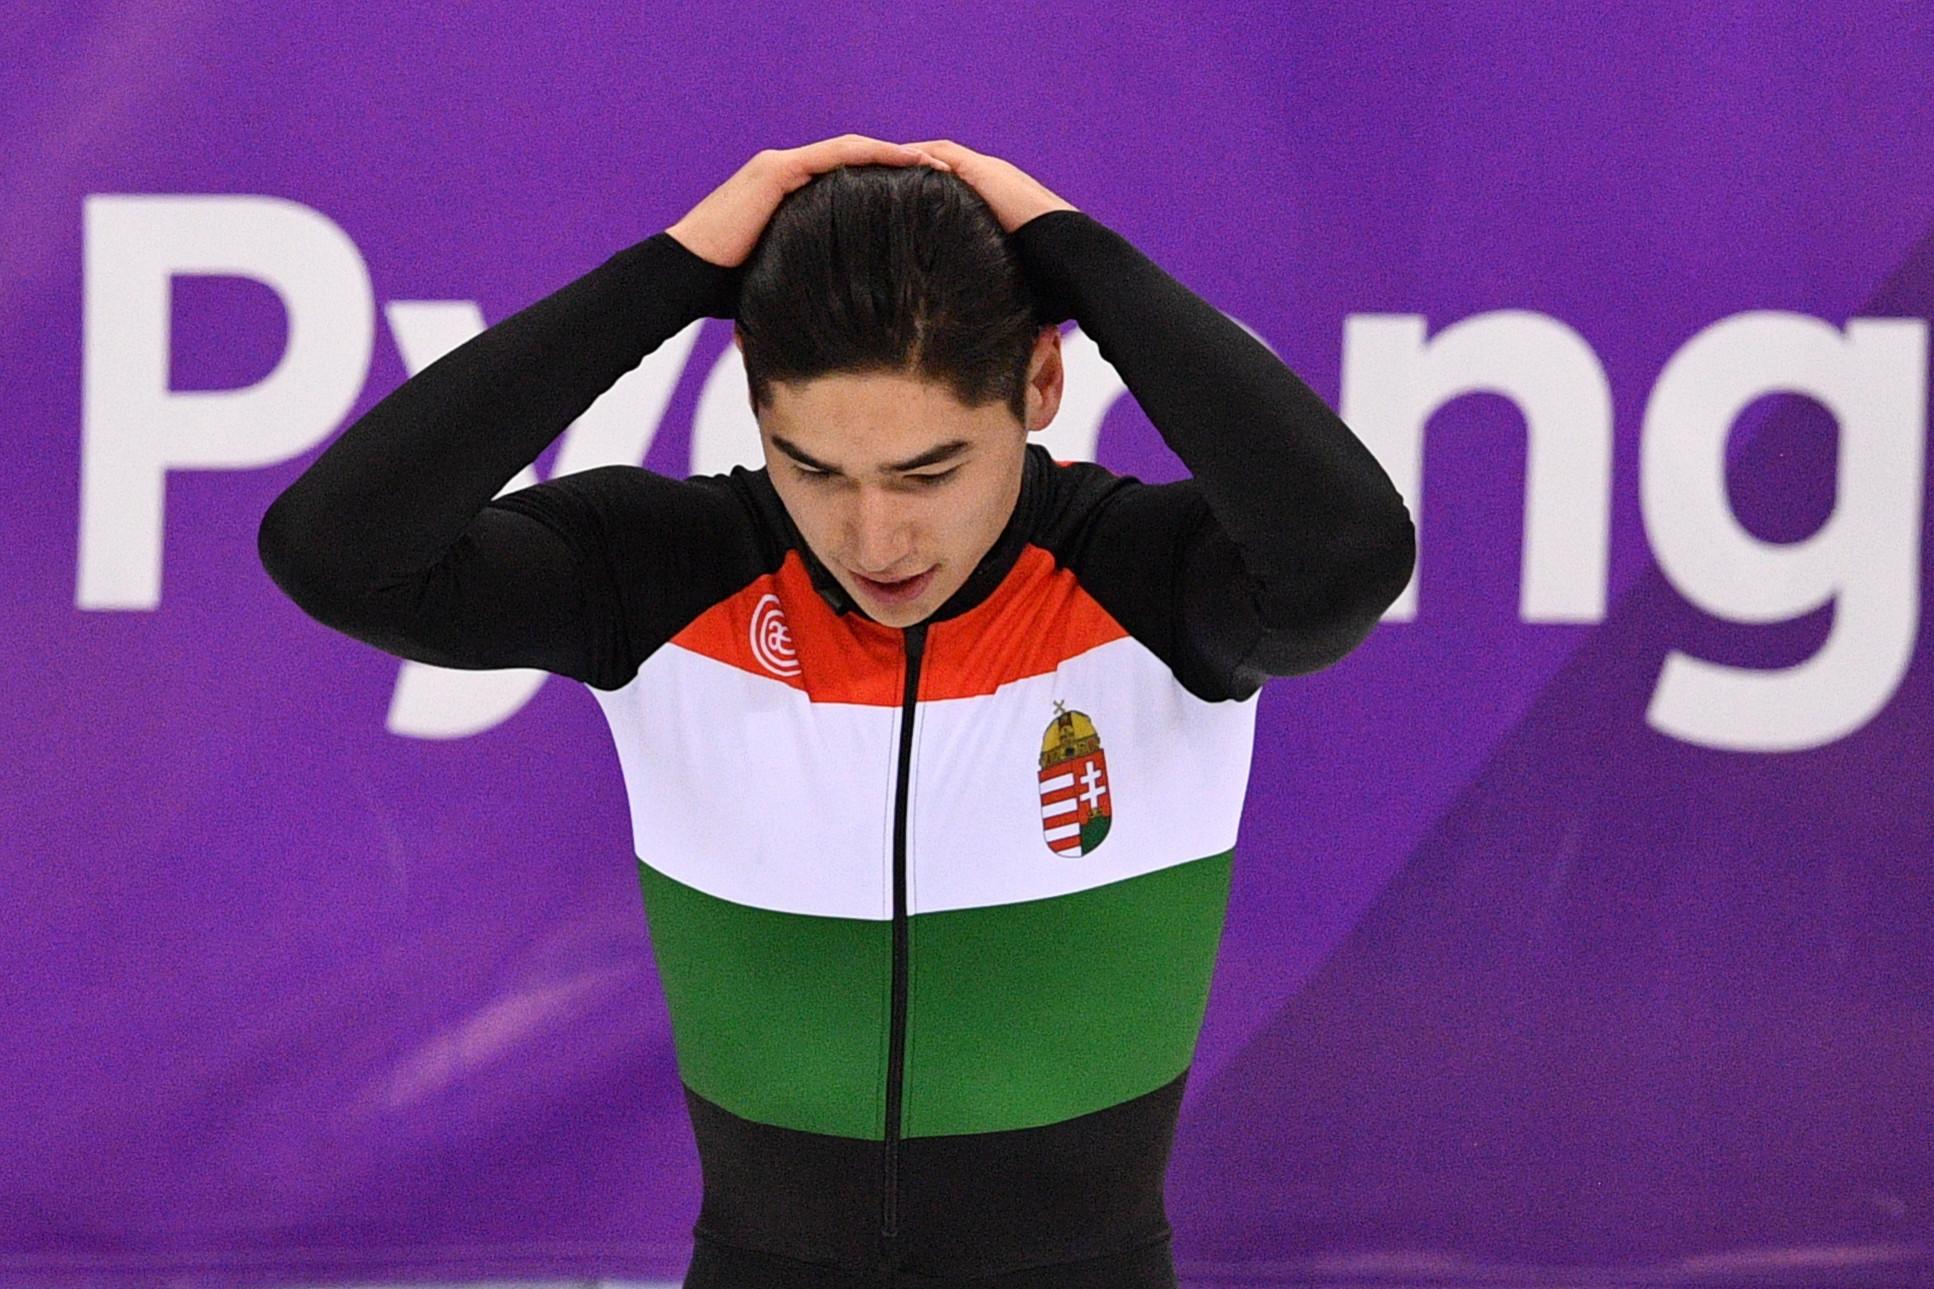 Shaoang Liu is on the men's start-list despite breaking three bones in his hand last weekend ©Getty Images